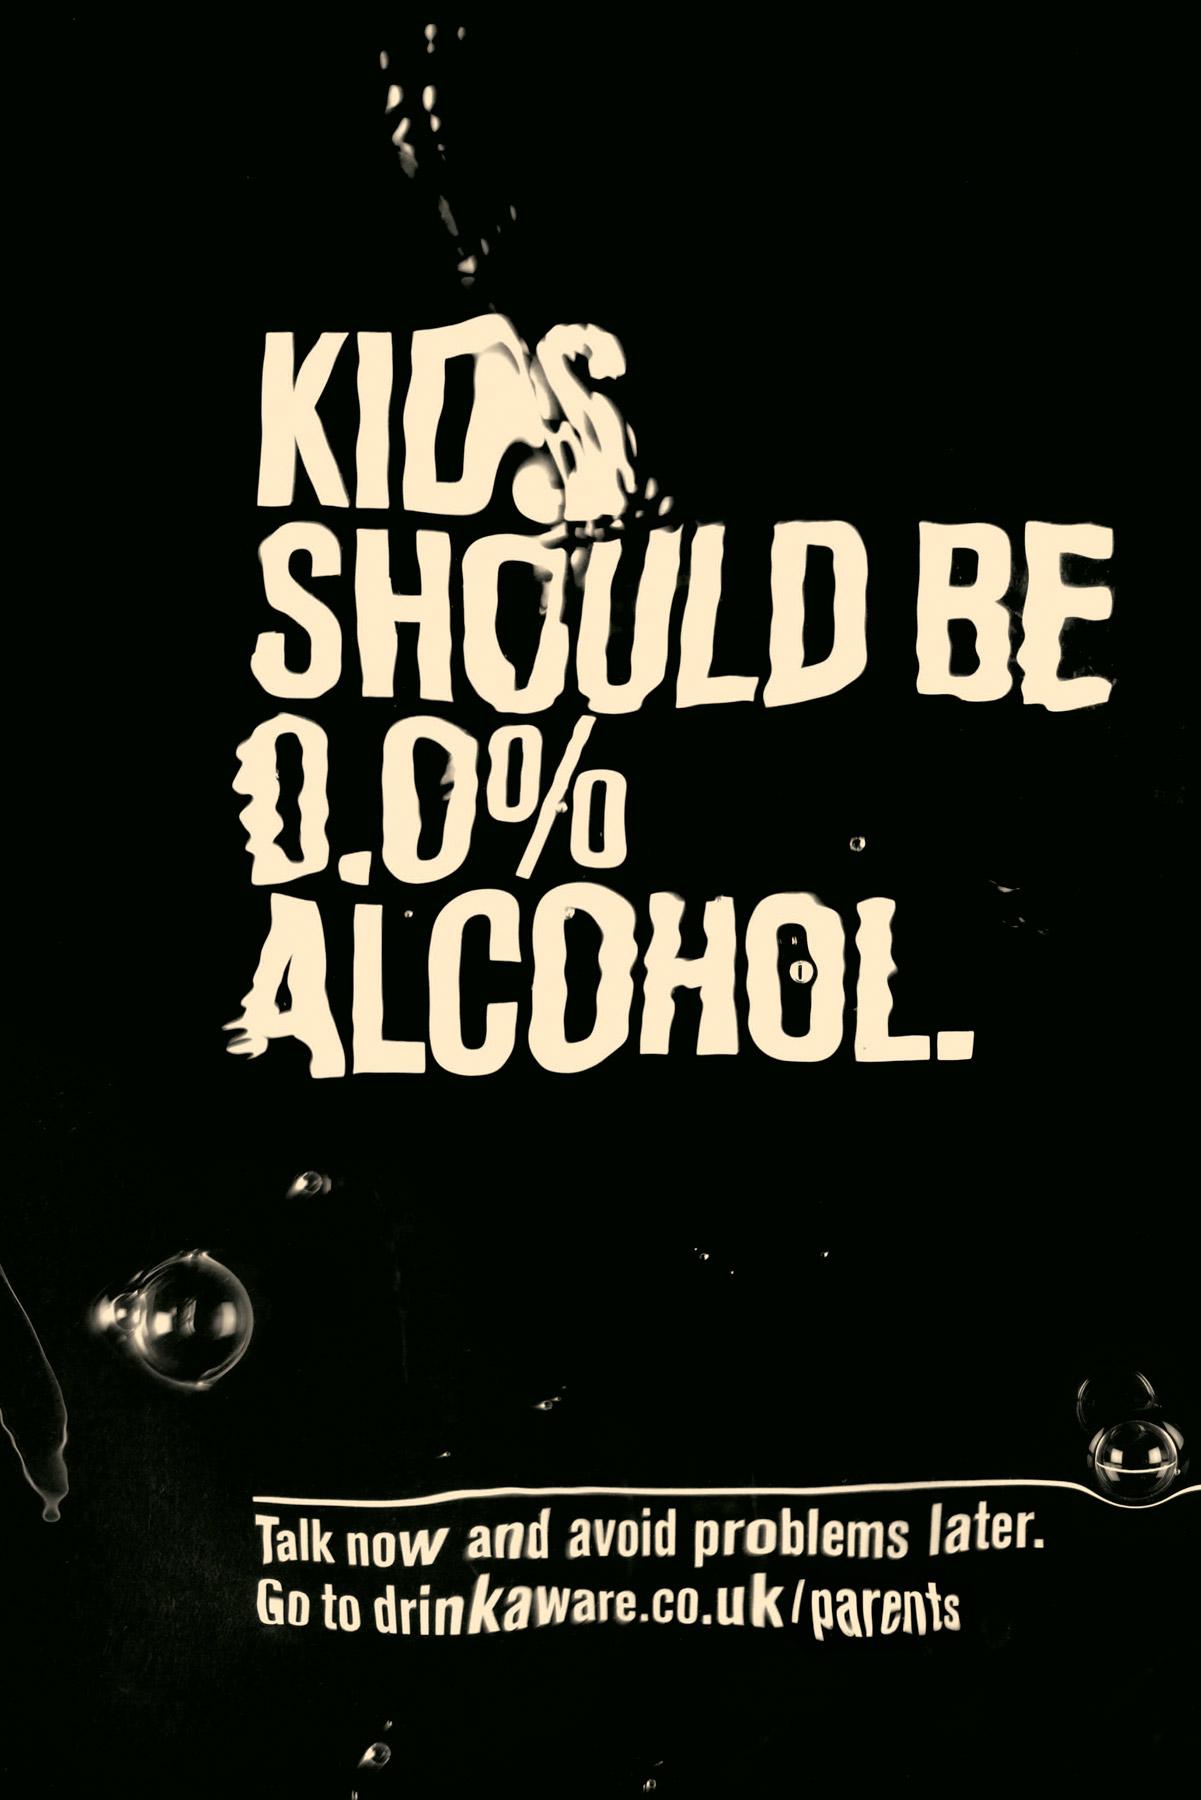 kids-should-drinkware-sean-doyle-paul-belford-tbwa